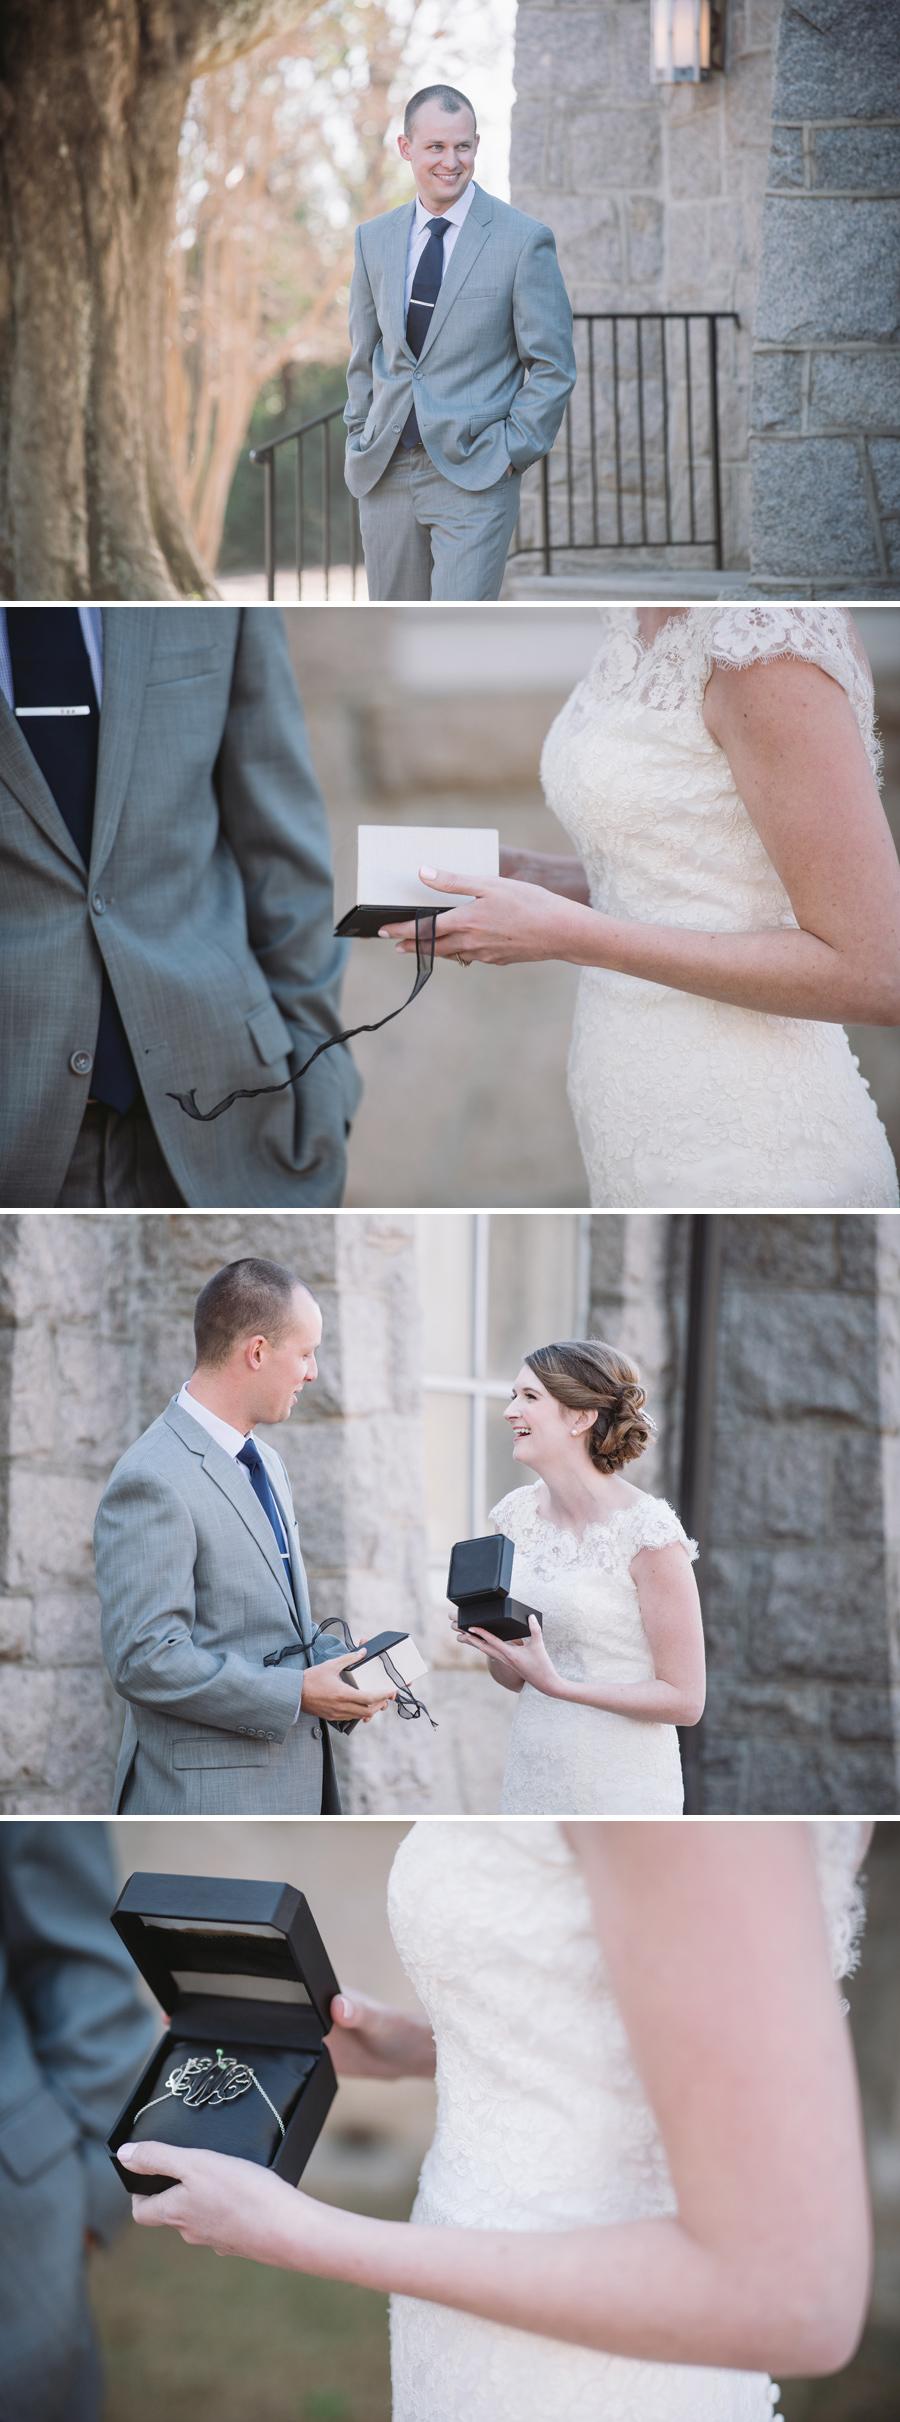 lauren-bryan-wedding-stone -river-columbia